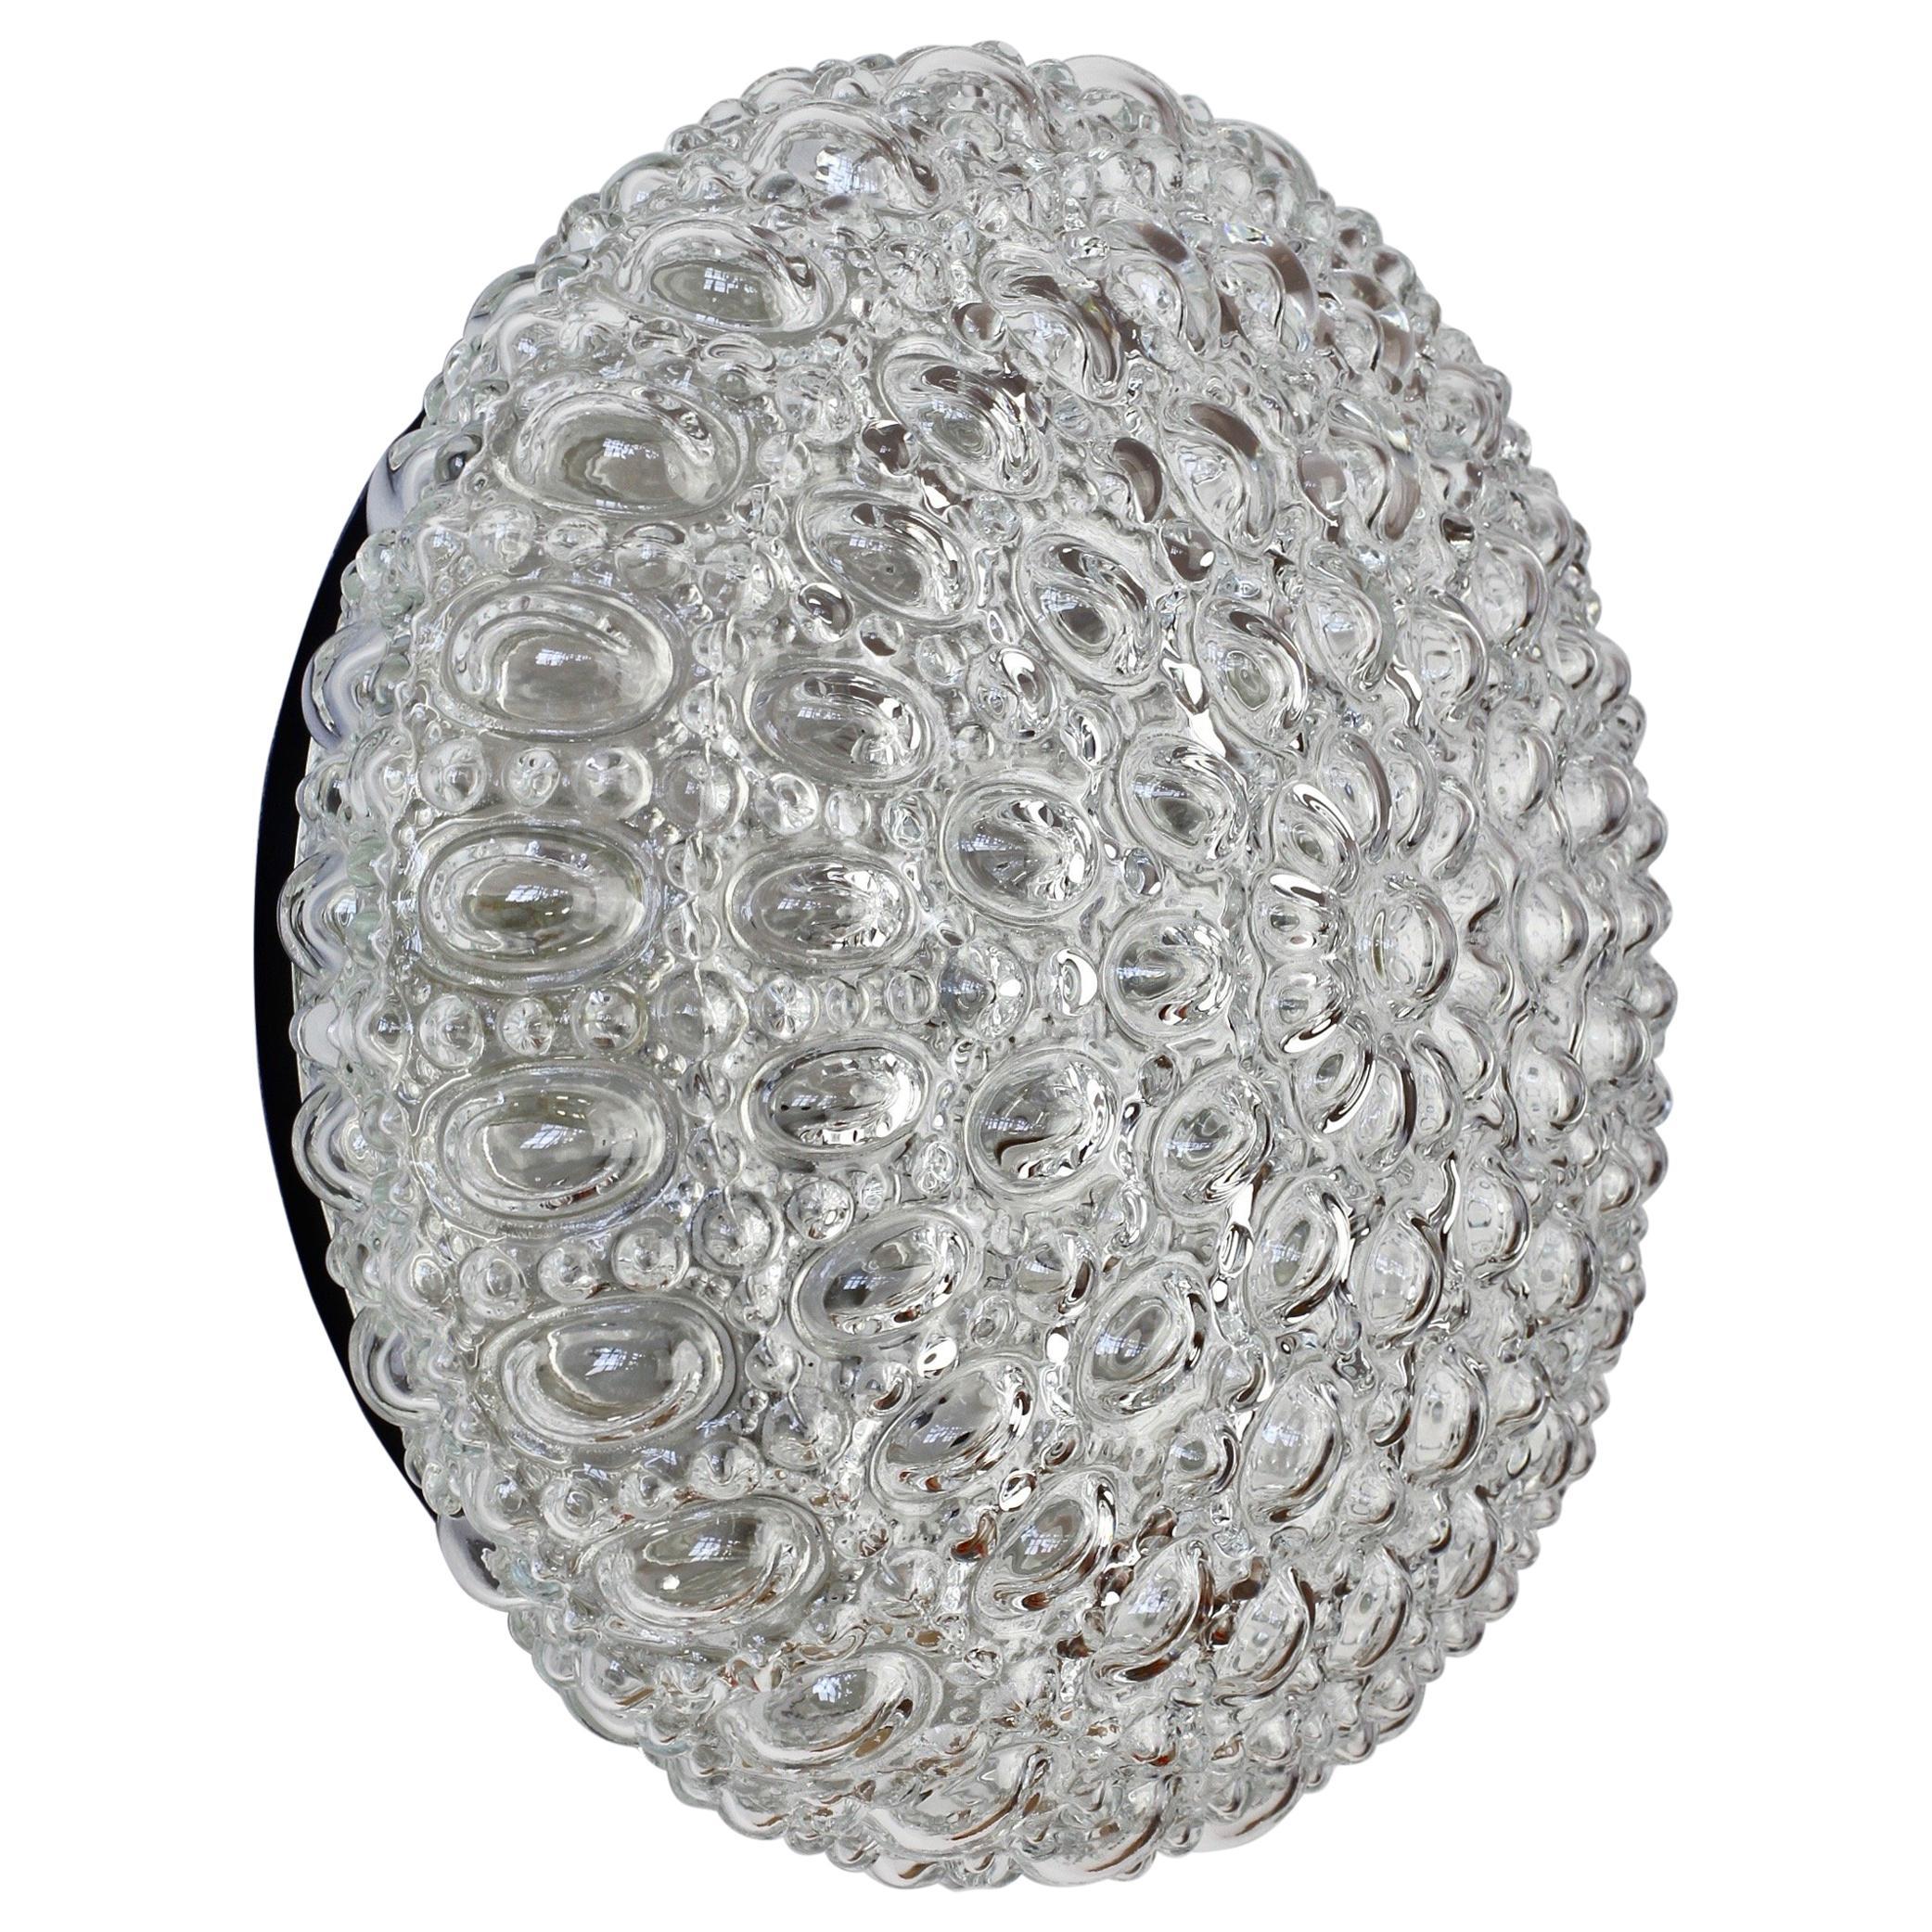 Limburg Vintage Clear Bubble Glass Flush Mount Wall Light / Lamp 1970s